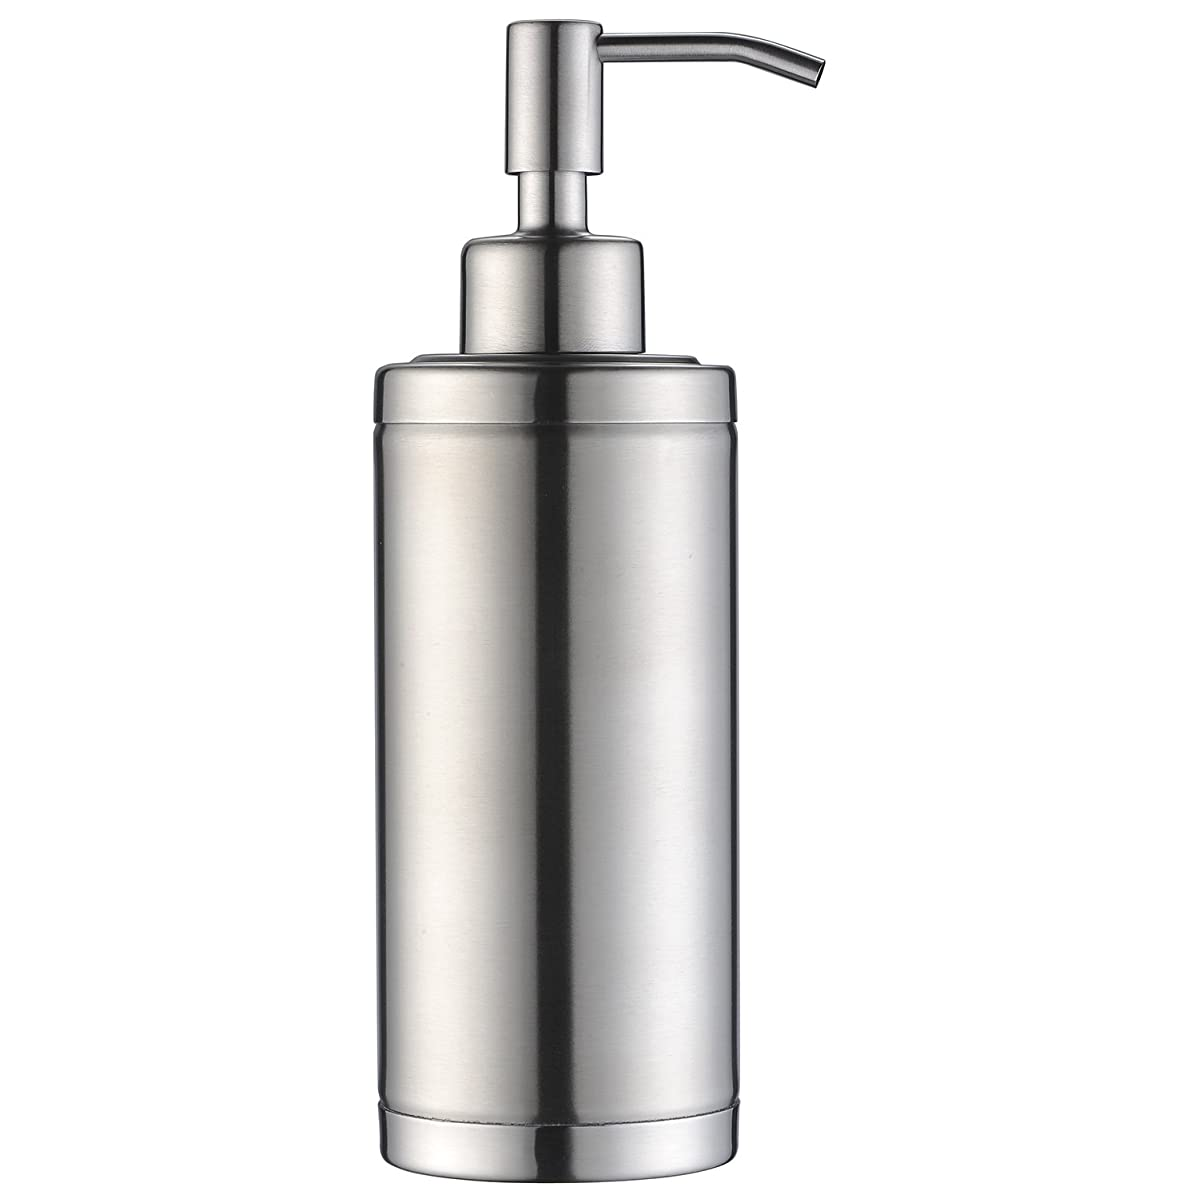 KVADRAT Full Stainless Steel Countertop Sink Soap Dispenser Prime 300 ML Liquid Bottle for Kitchen & Bathroom Hand Dish Lotion (Brushed Nickel LAB1-04)